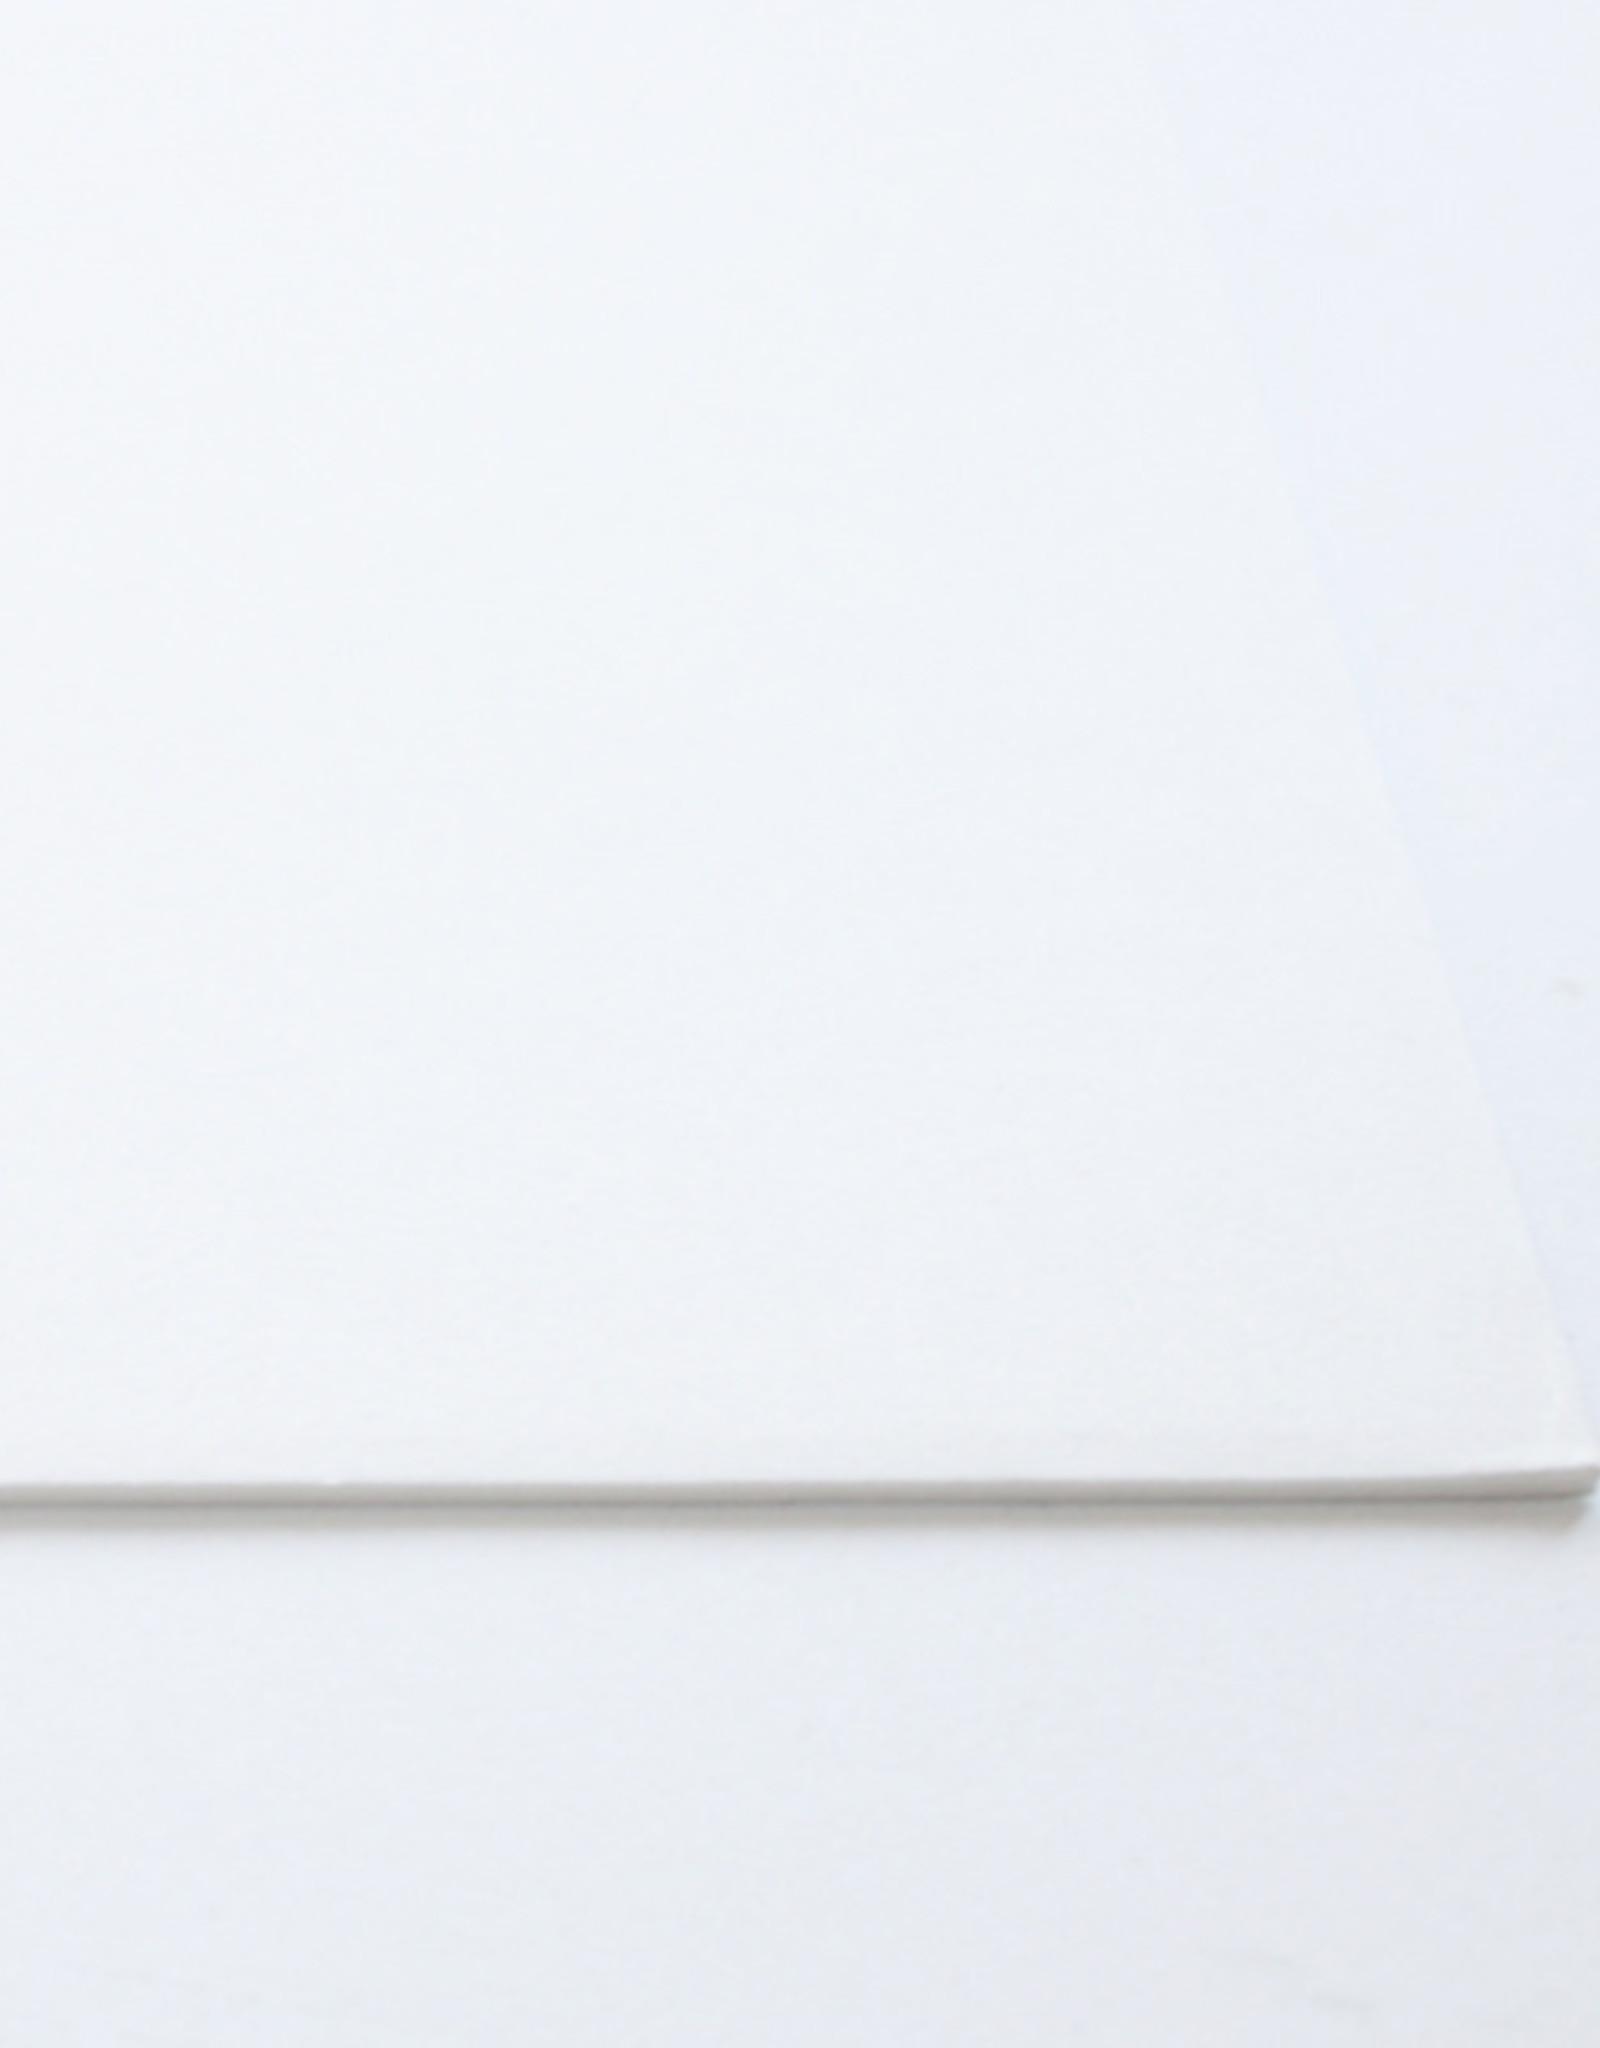 Barth 8 vel Passepartoutkarton 800 grs (± 1 mm dik) 40x 50 ConservaBarth  natuurwit